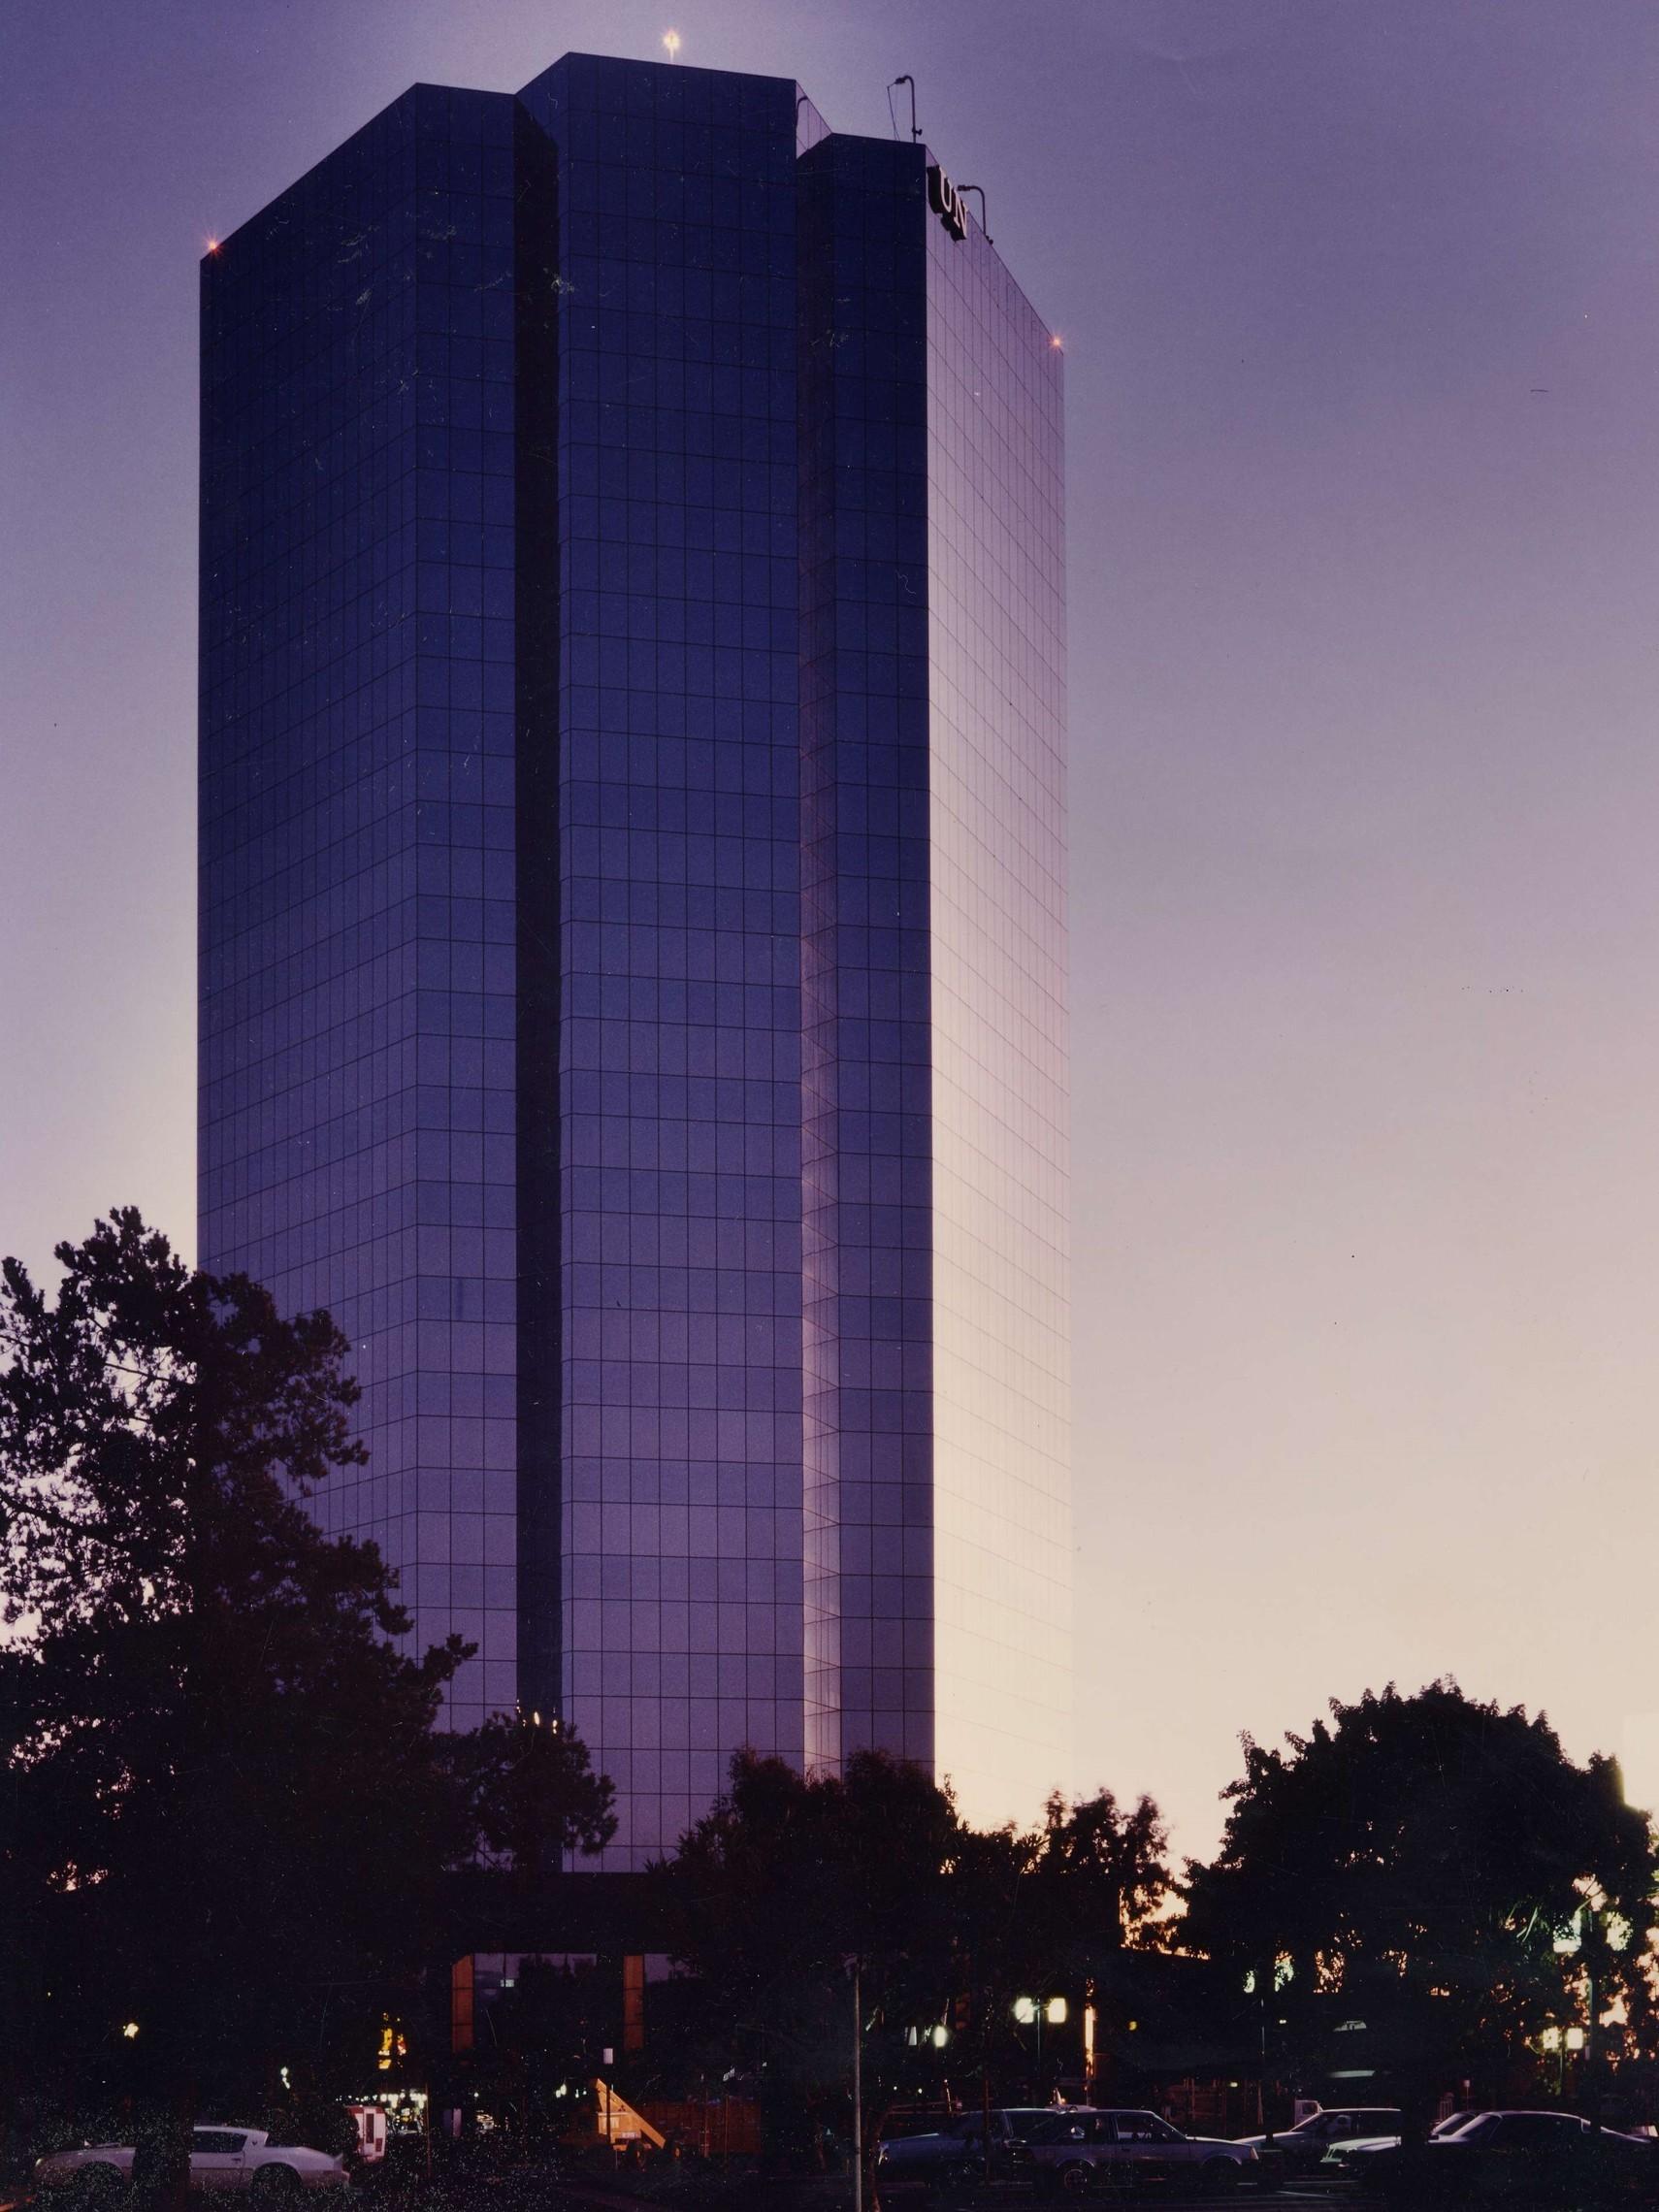 Oxnard Financial Plaza 2